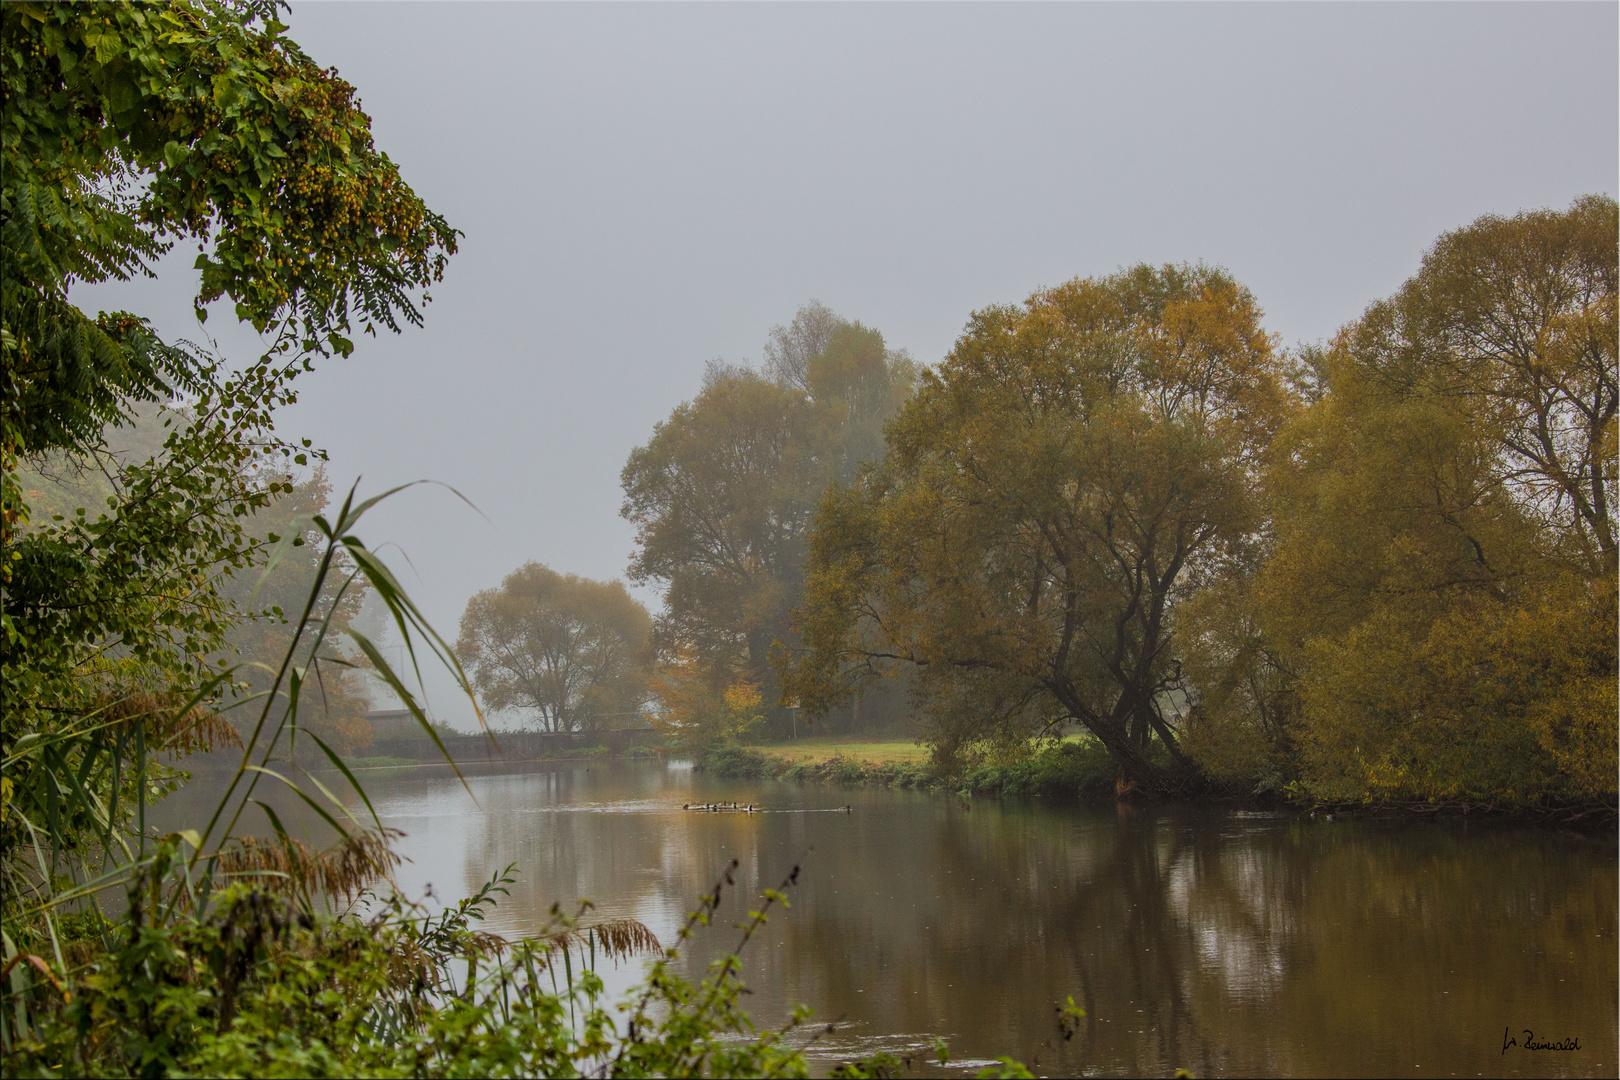 Nebel in Büchenbach 1